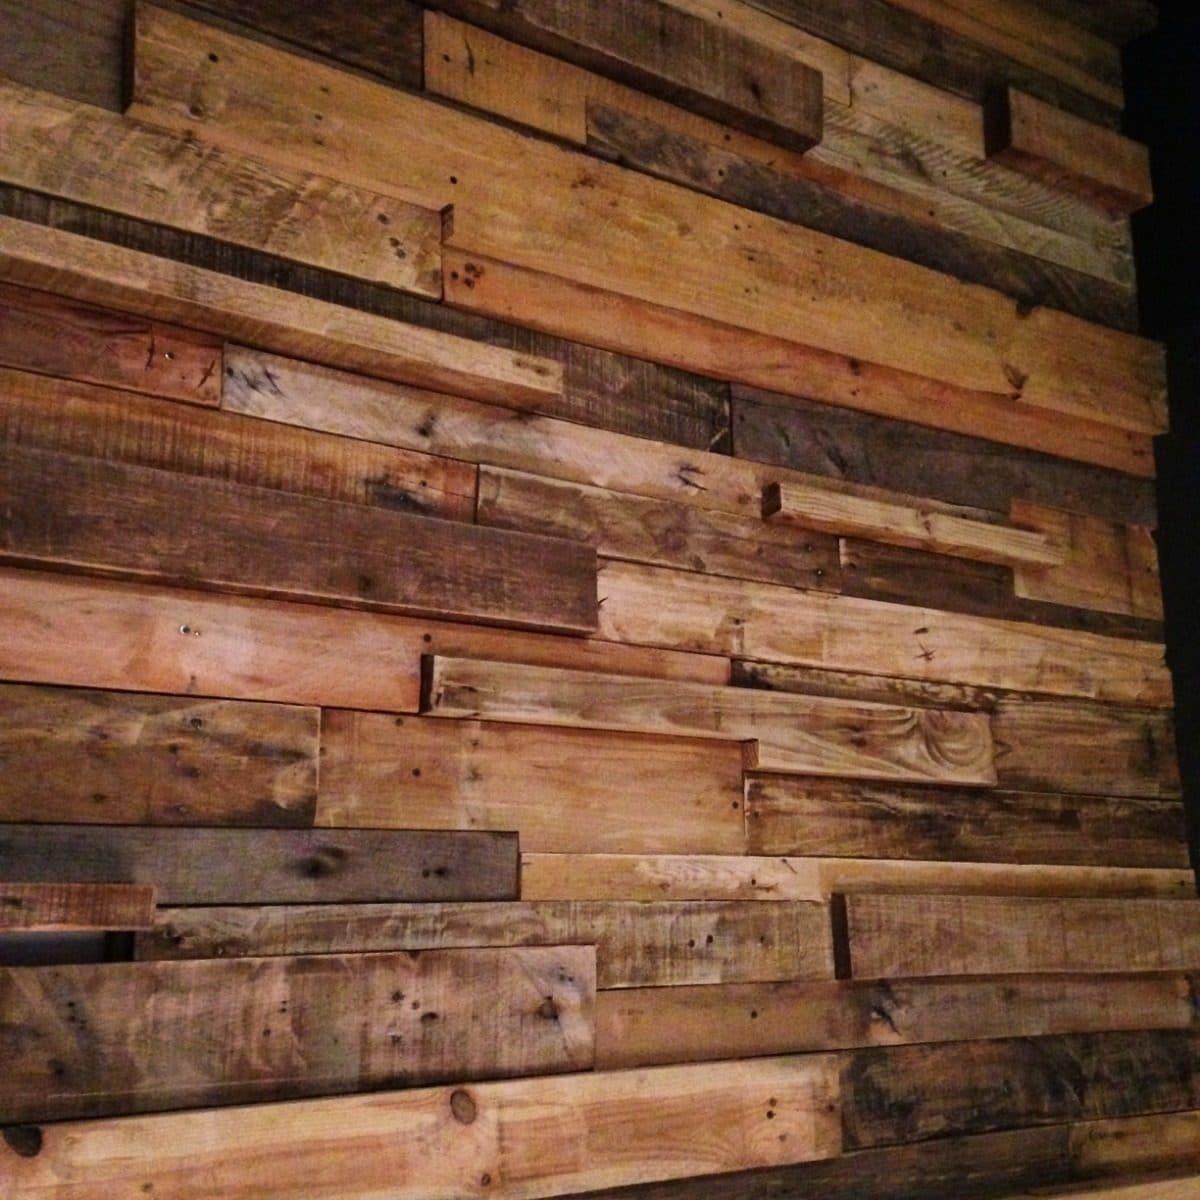 Tablas de madera usada para revestimiento stockpalet - Madera para paredes ...